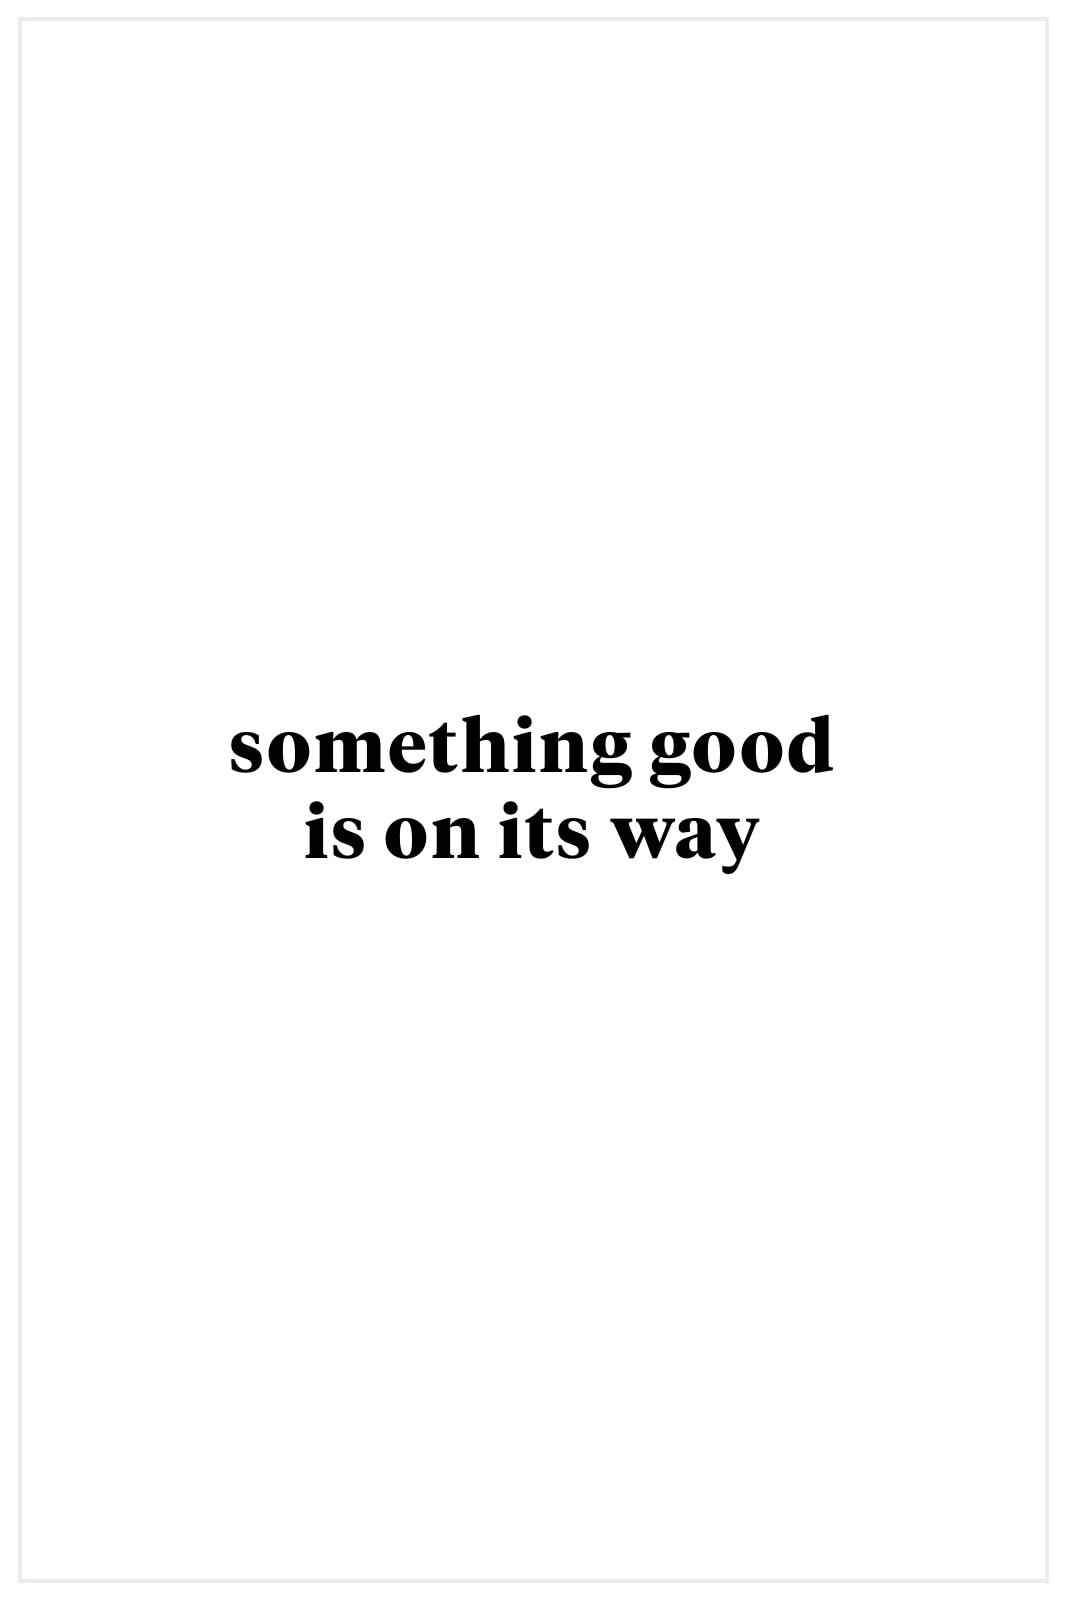 NEW BALANCE 574 Pebbled Street Sneaker